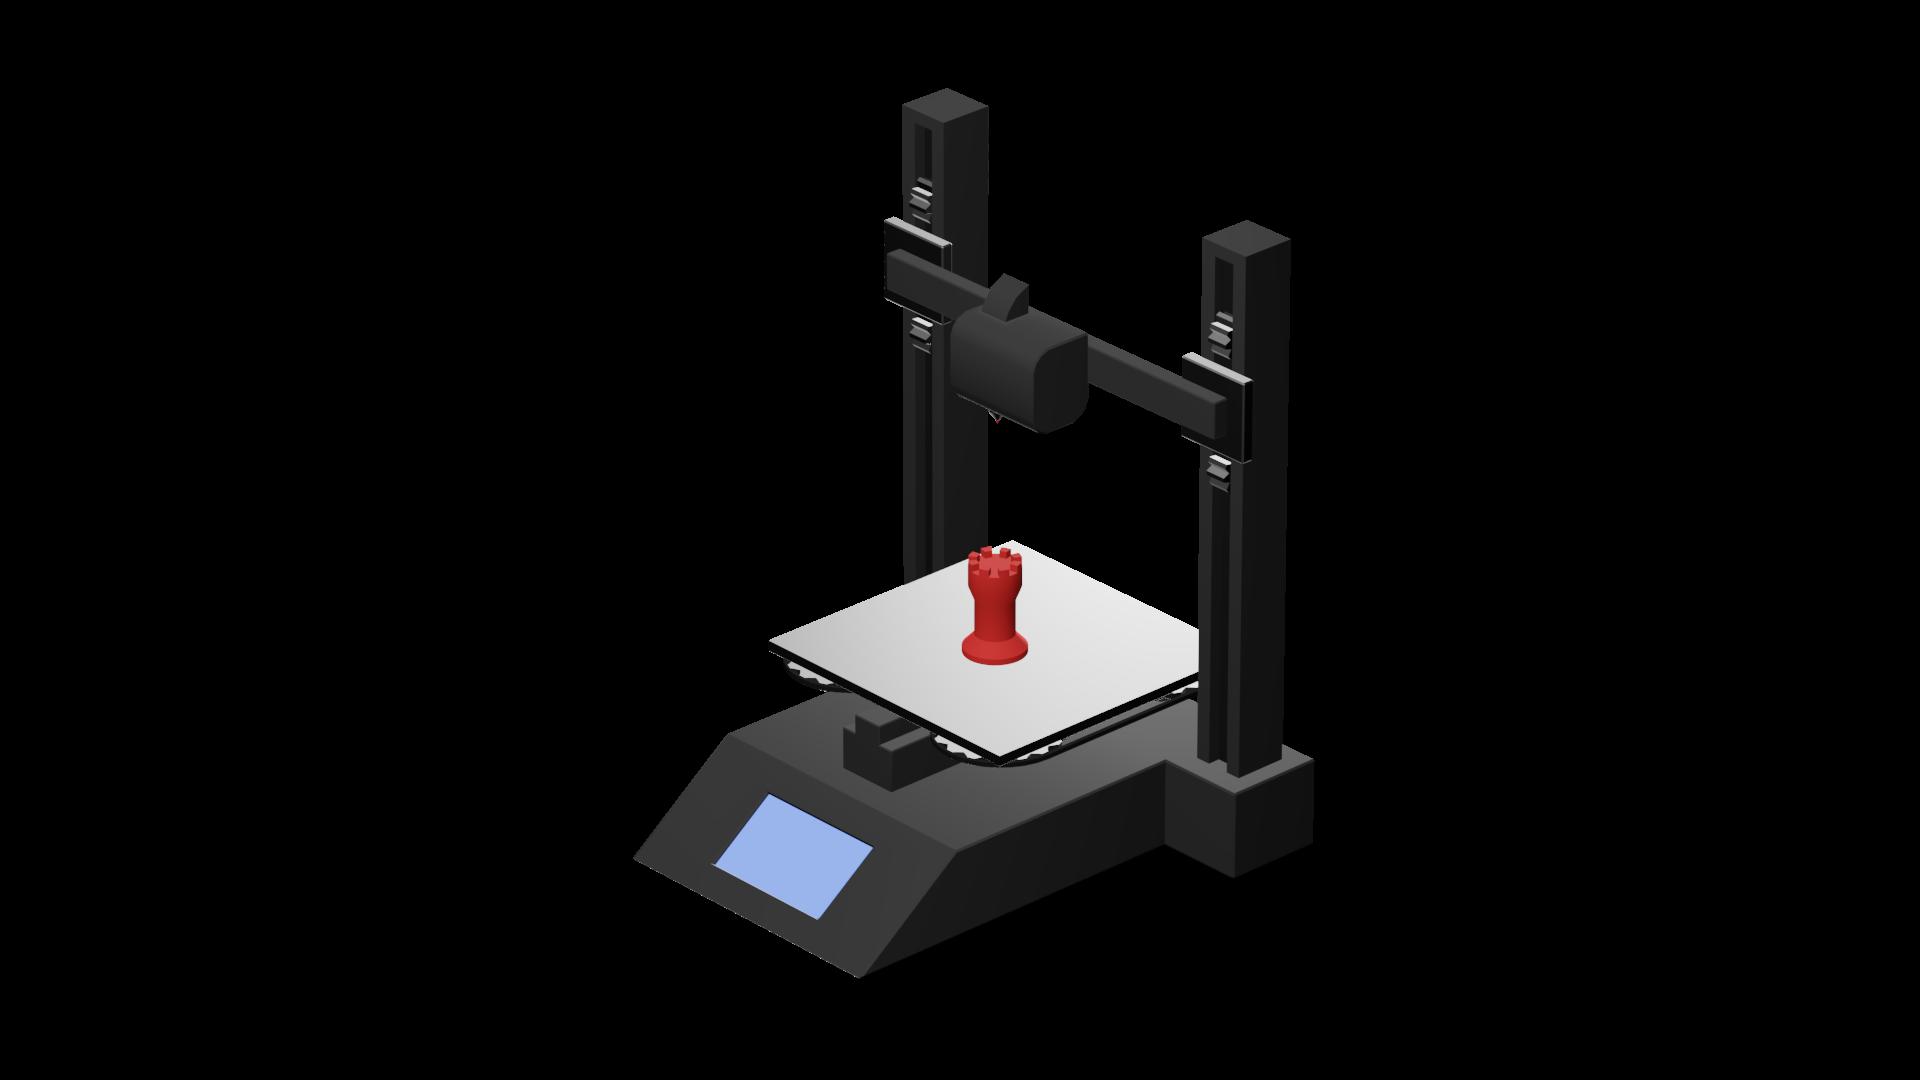 webd_printer_render